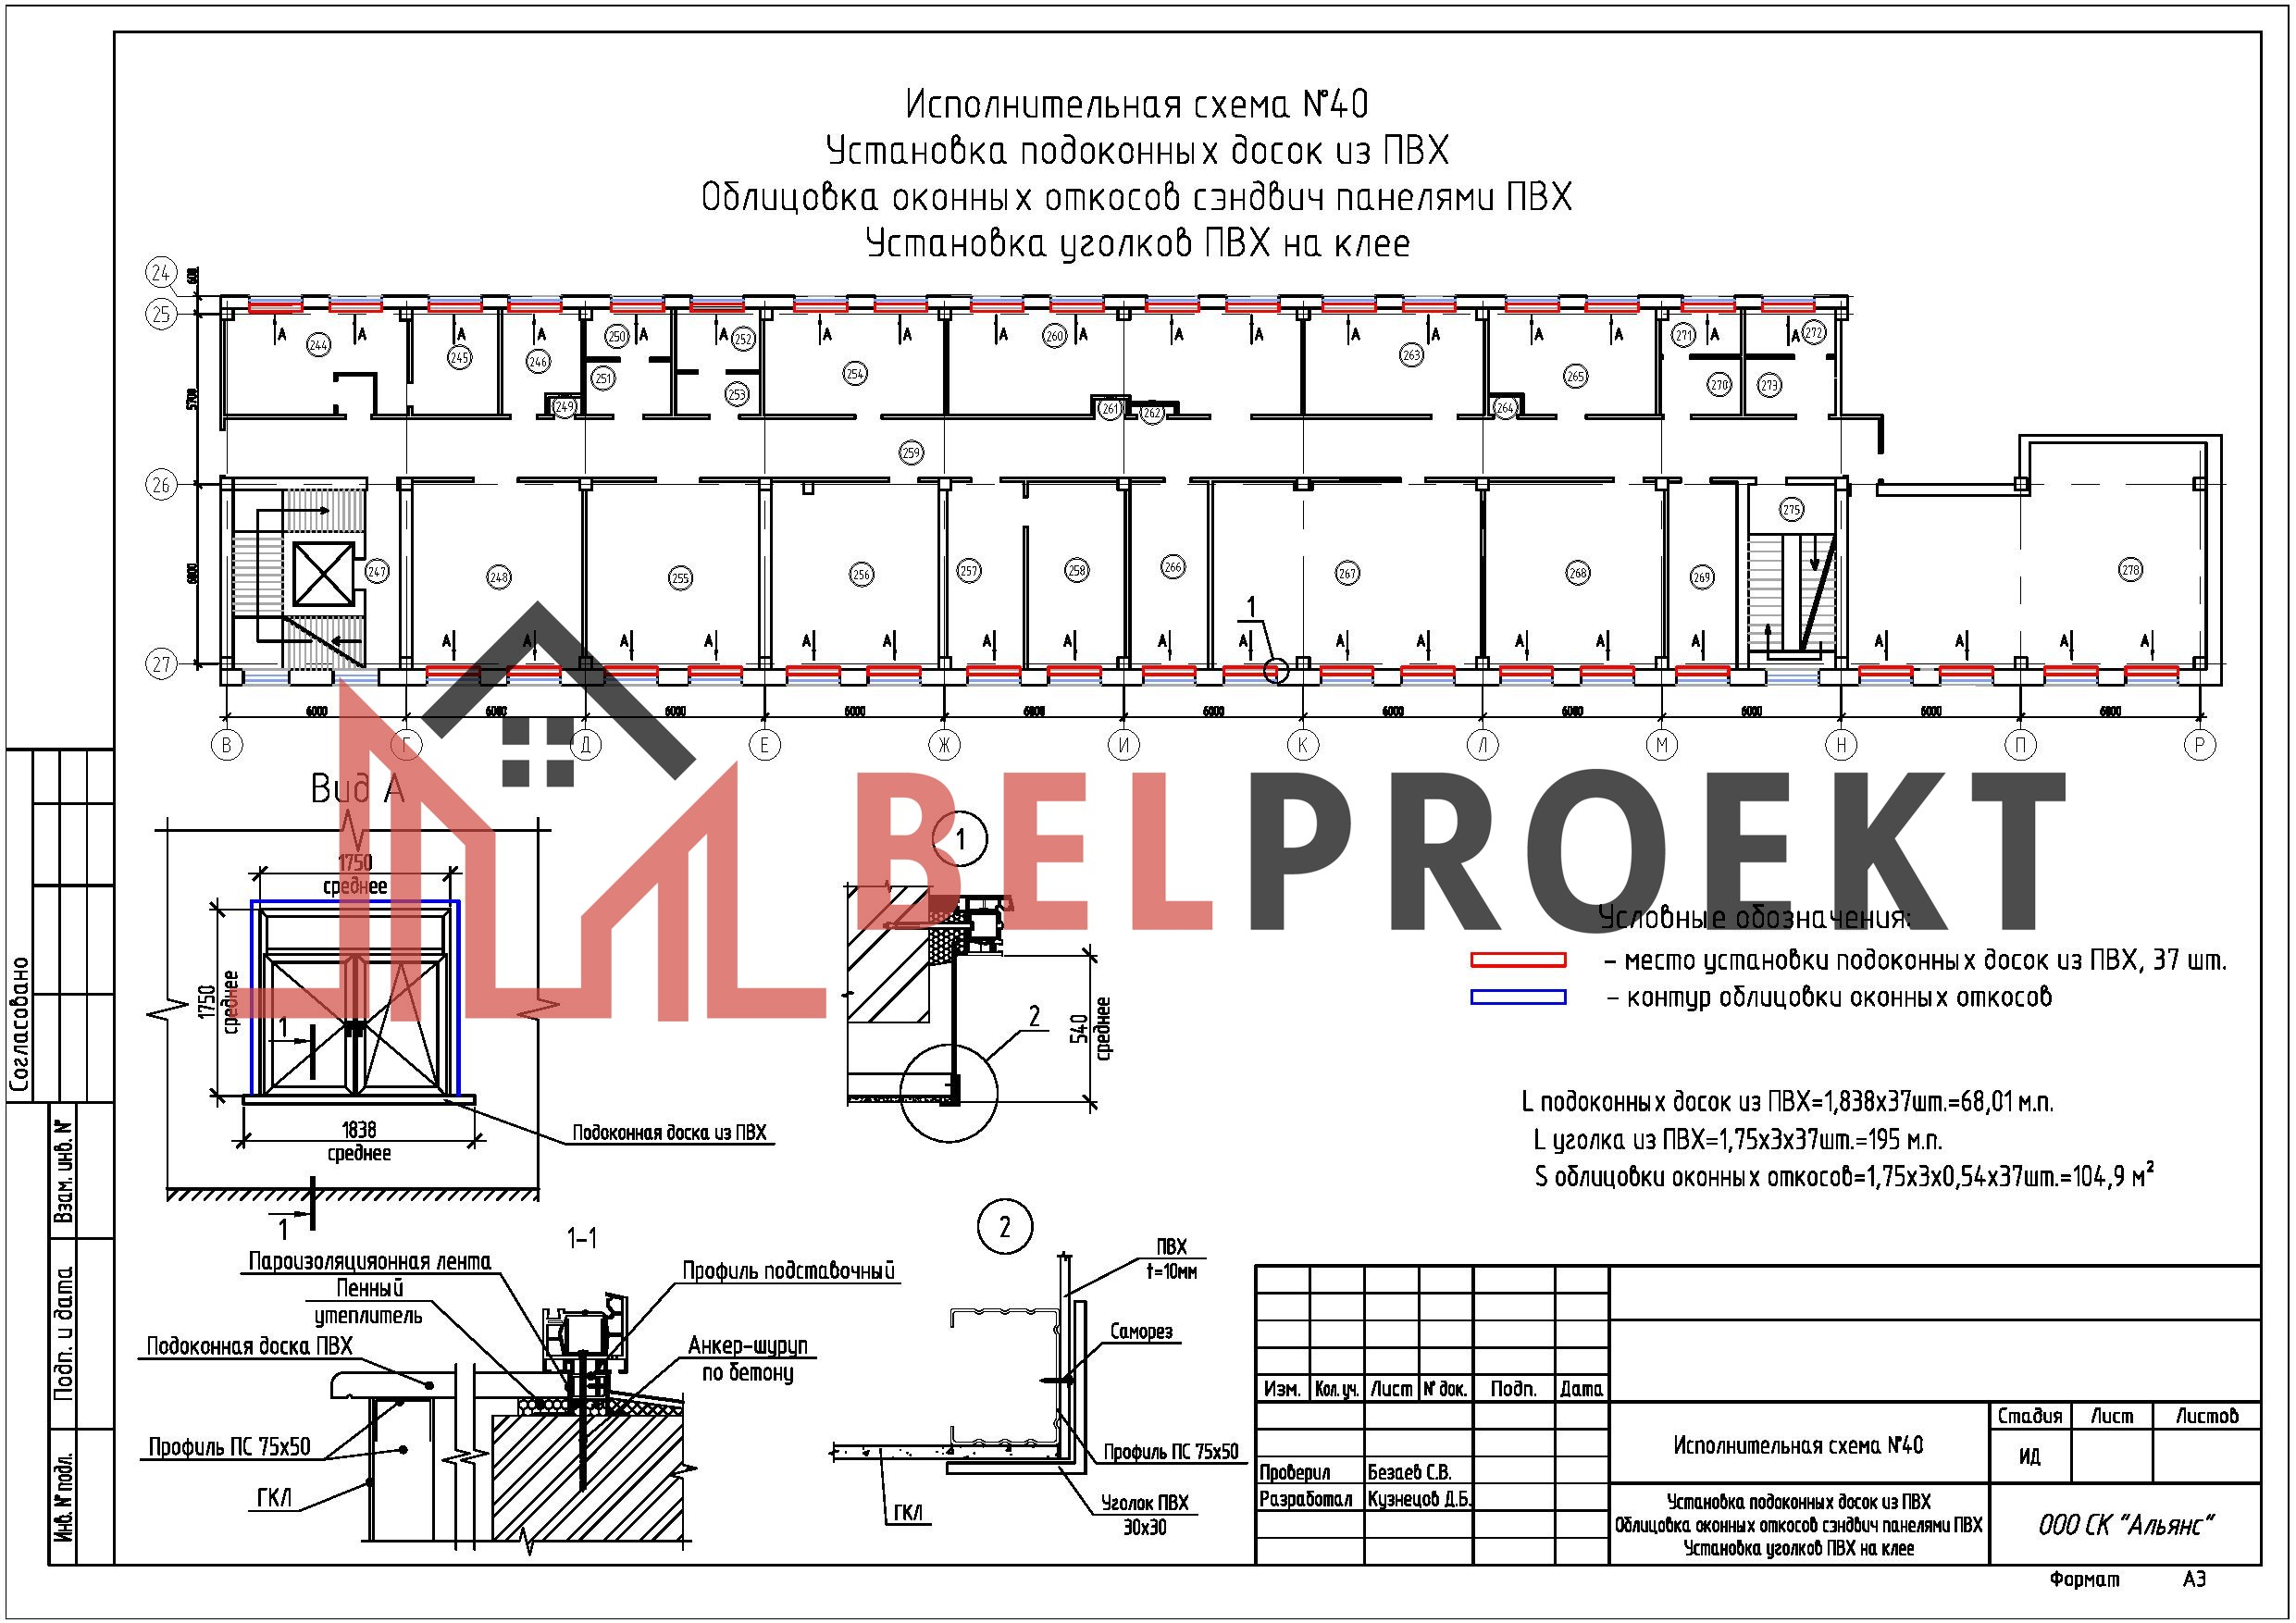 Новосибирск k-flex теплоизоляция